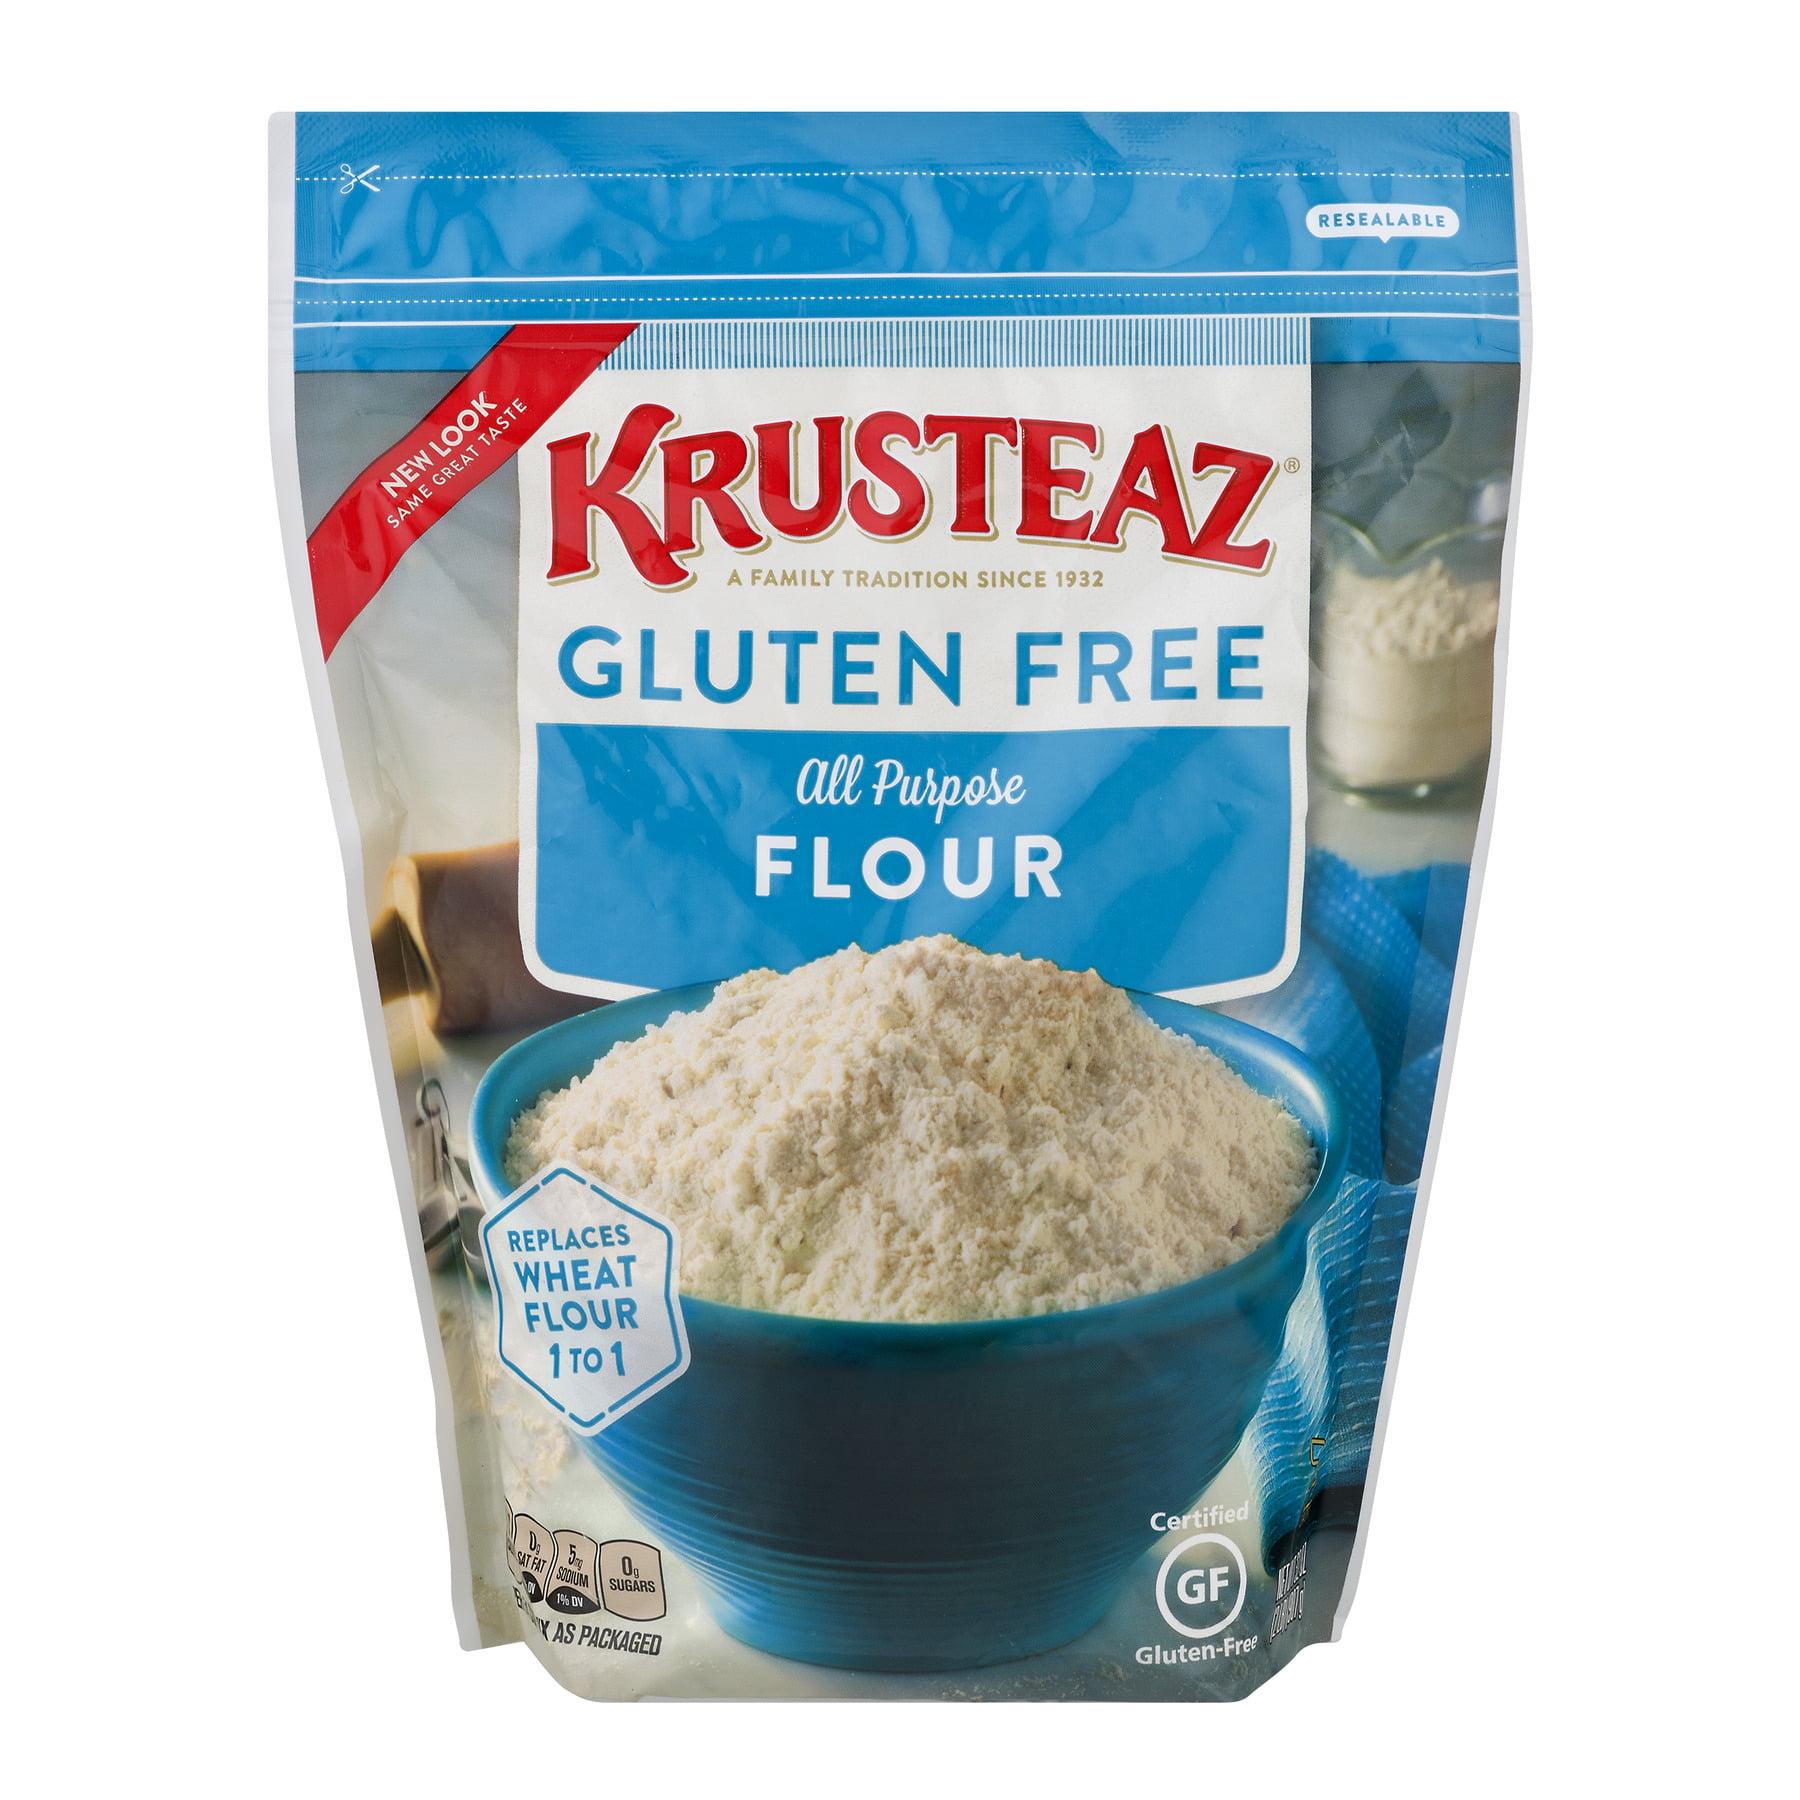 (2 Pack) Krusteaz Gluten Free All Purpose Flour Mix, 32-Ounce